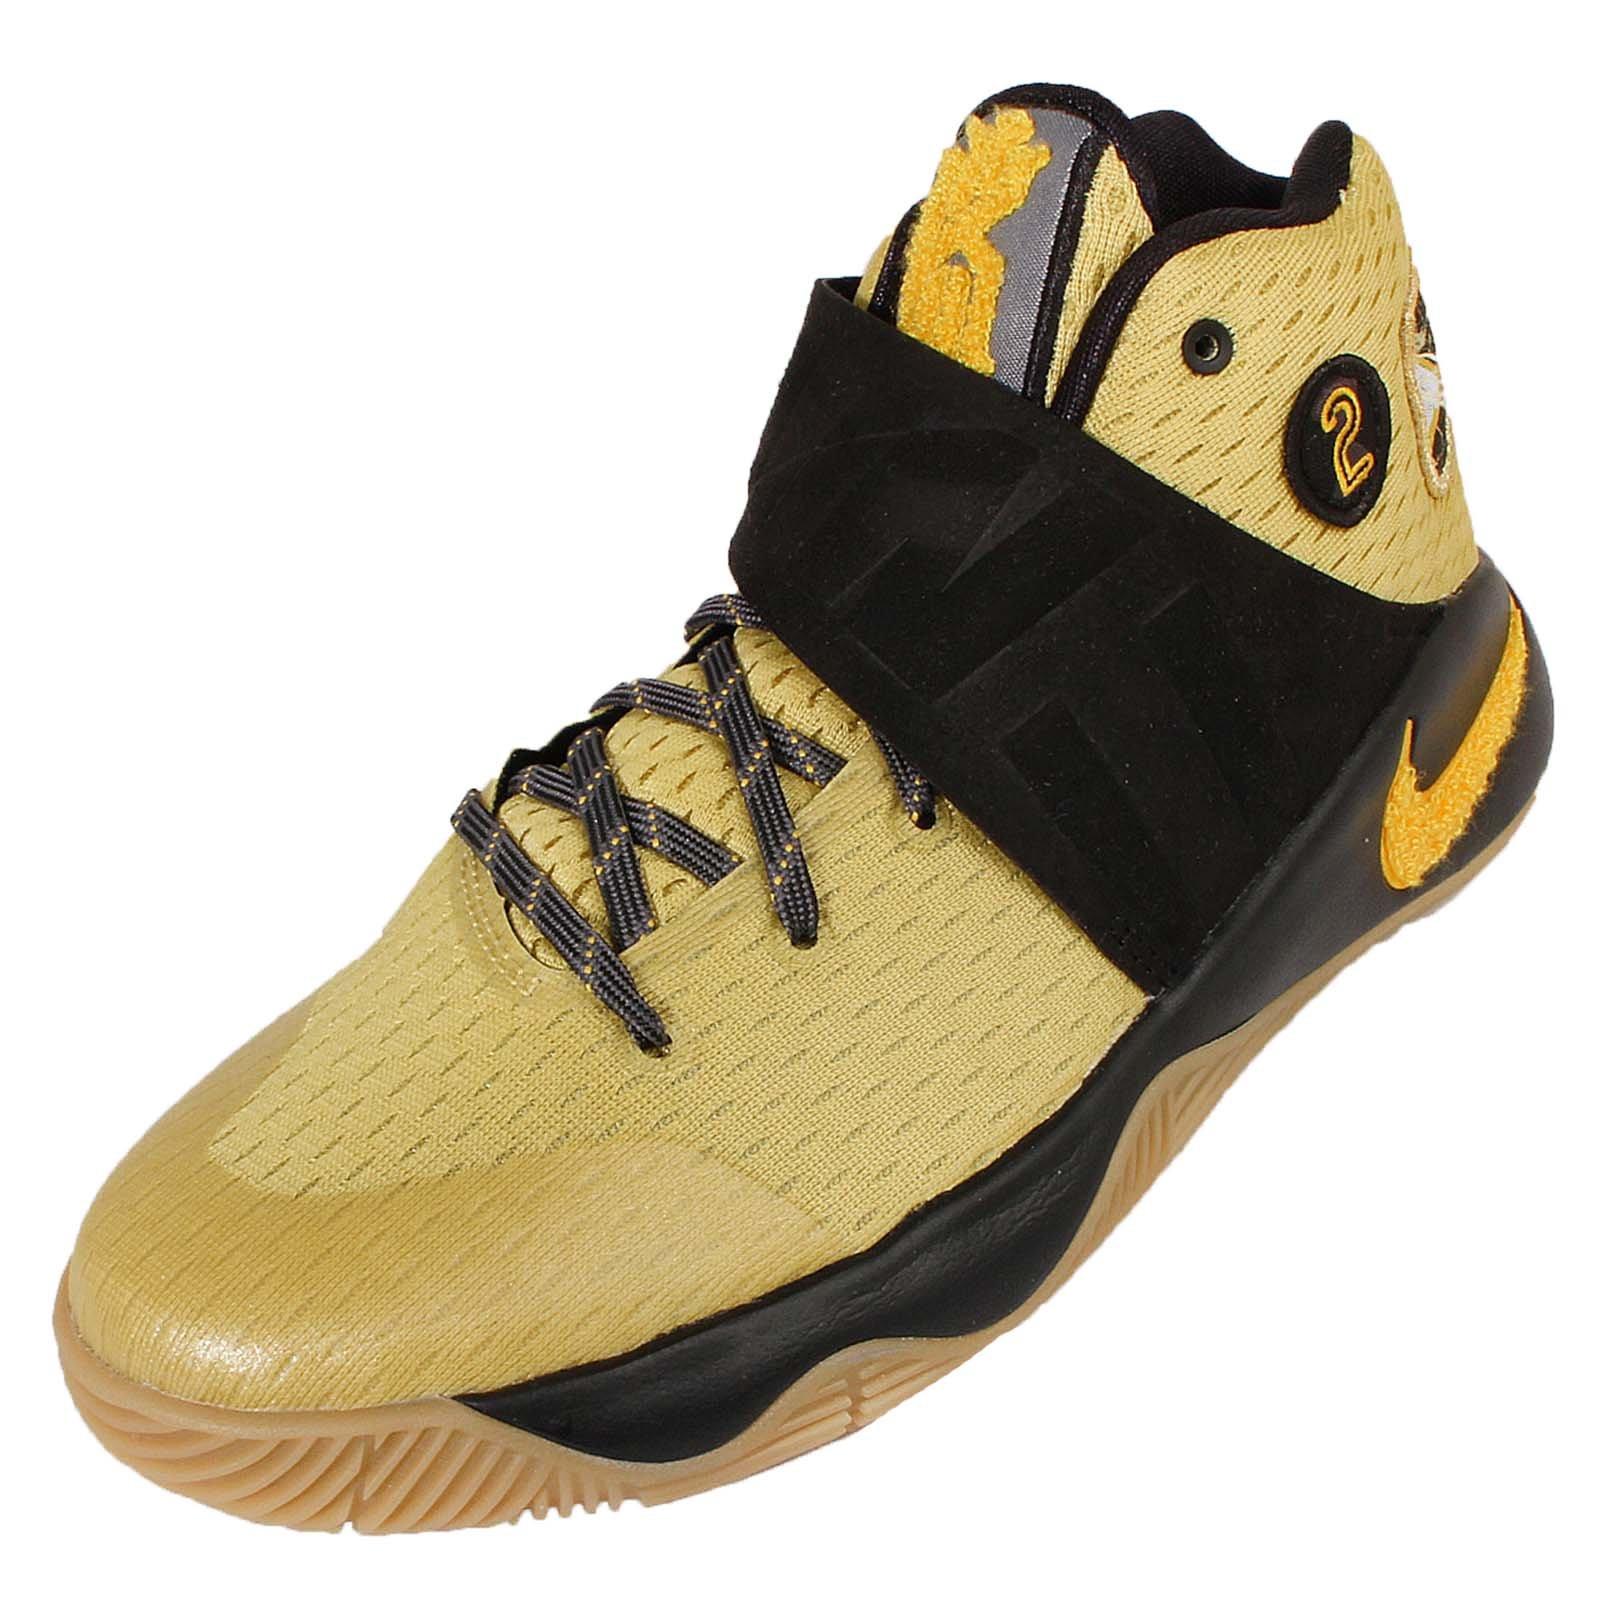 Nike Kids Kyrie 2 AS GS, ALL STAR-CELERY/VARSITY MAIZE-BLACK, Youth Size 6 by Nike (Image #2)